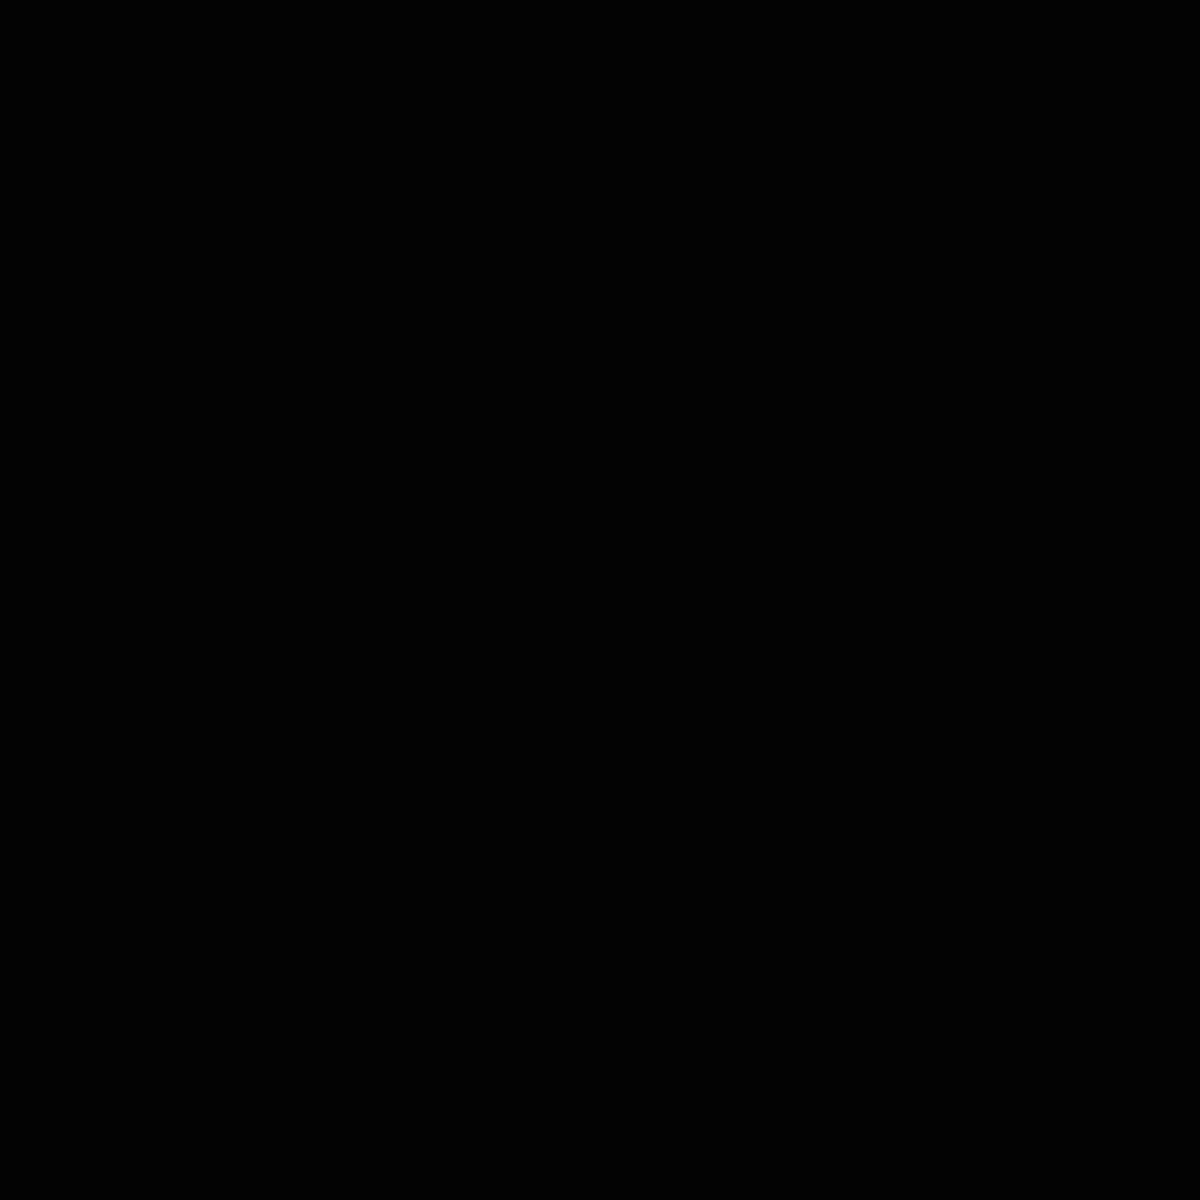 Organicline (10 ml) - PIGMENTS AMIEA ORGANICLINE NOIR EXTRA, Flacon 10 ml